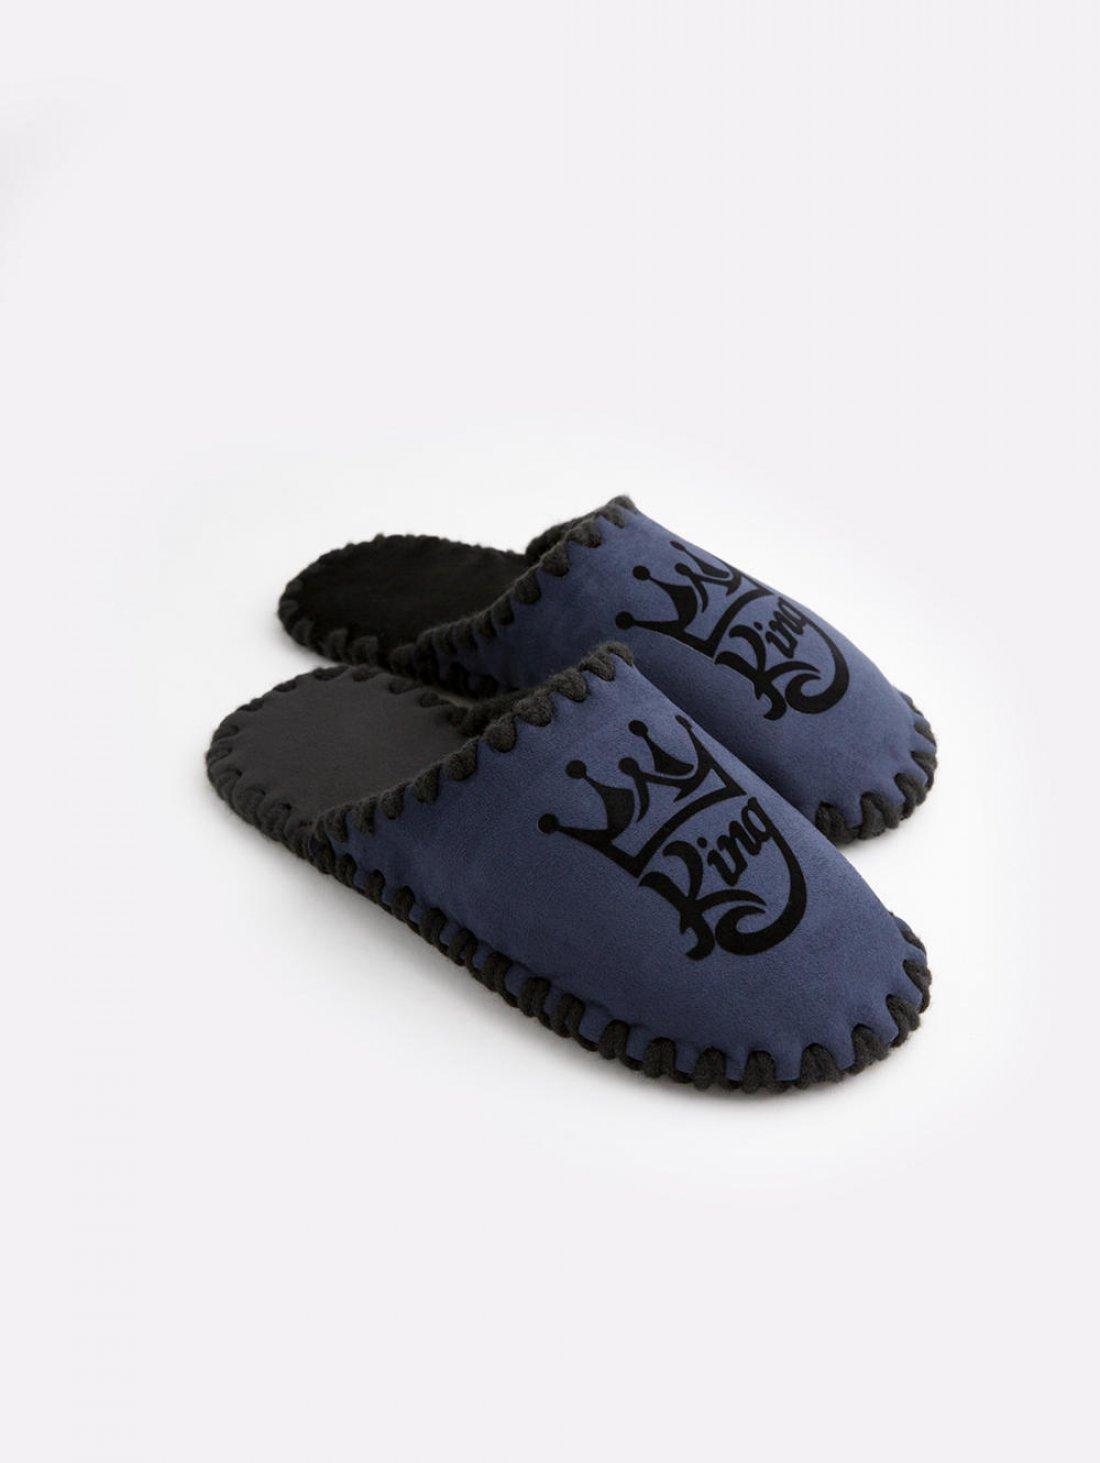 Мужские домашние тапочки King темно-синие закрытые, Family Story - 1